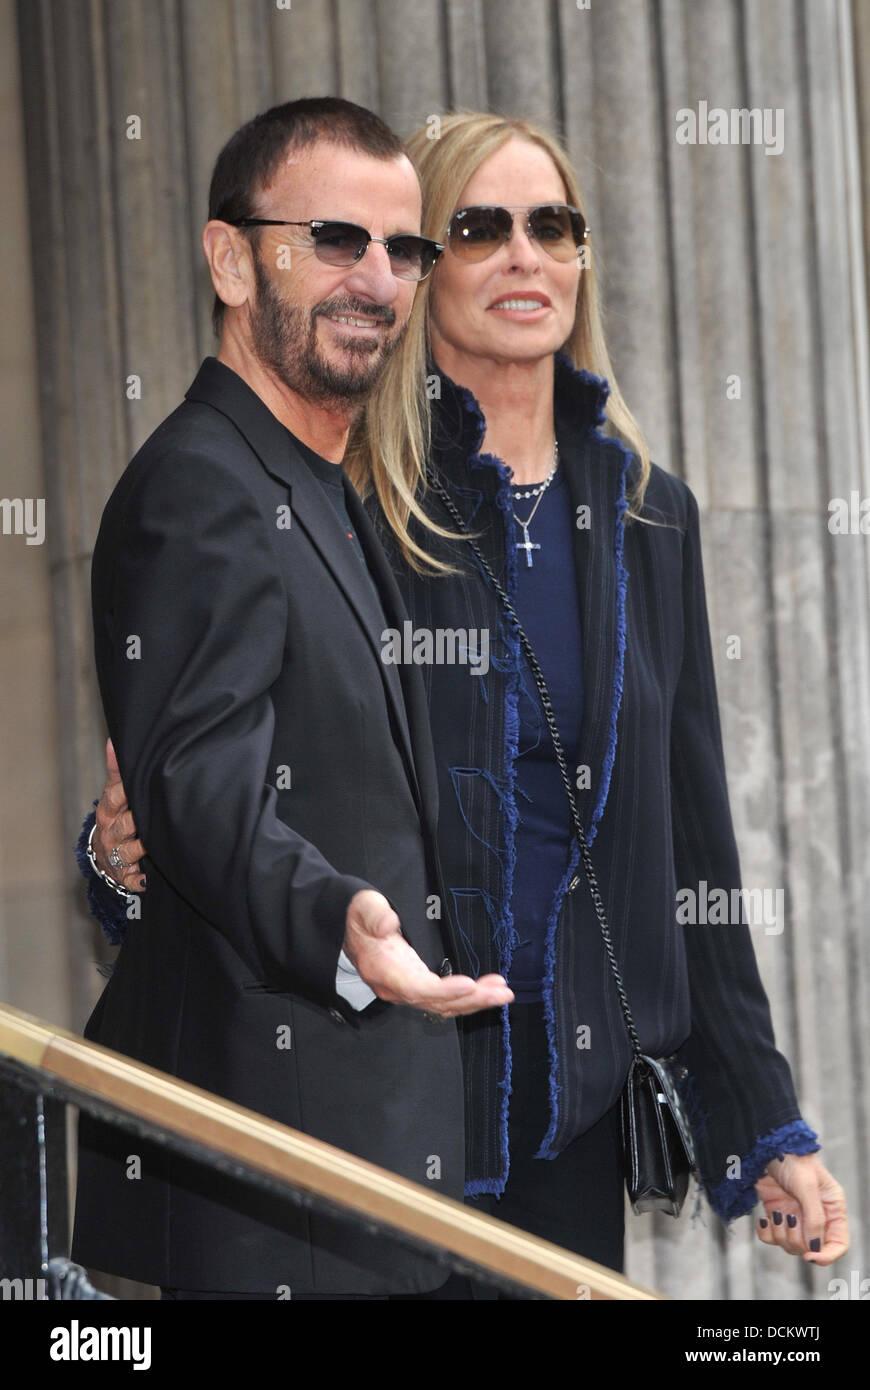 Ringo Starr And Barbara Bach The Wedding Of Sir Paul Mccartney And Stock Photo Alamy